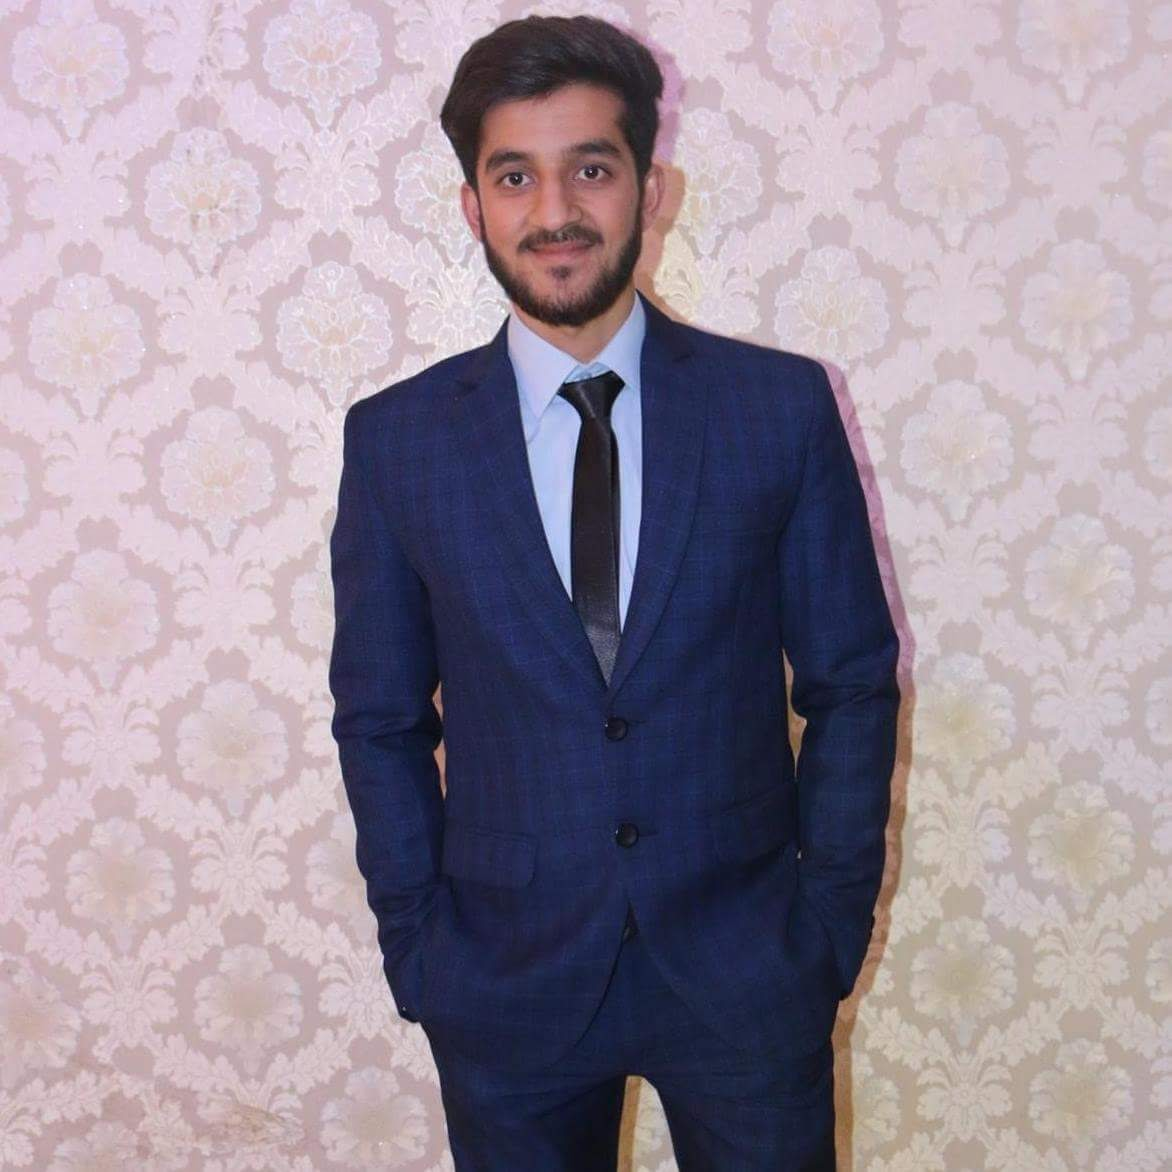 Faizan-Siddiqui-SEO-Expert-Botsify